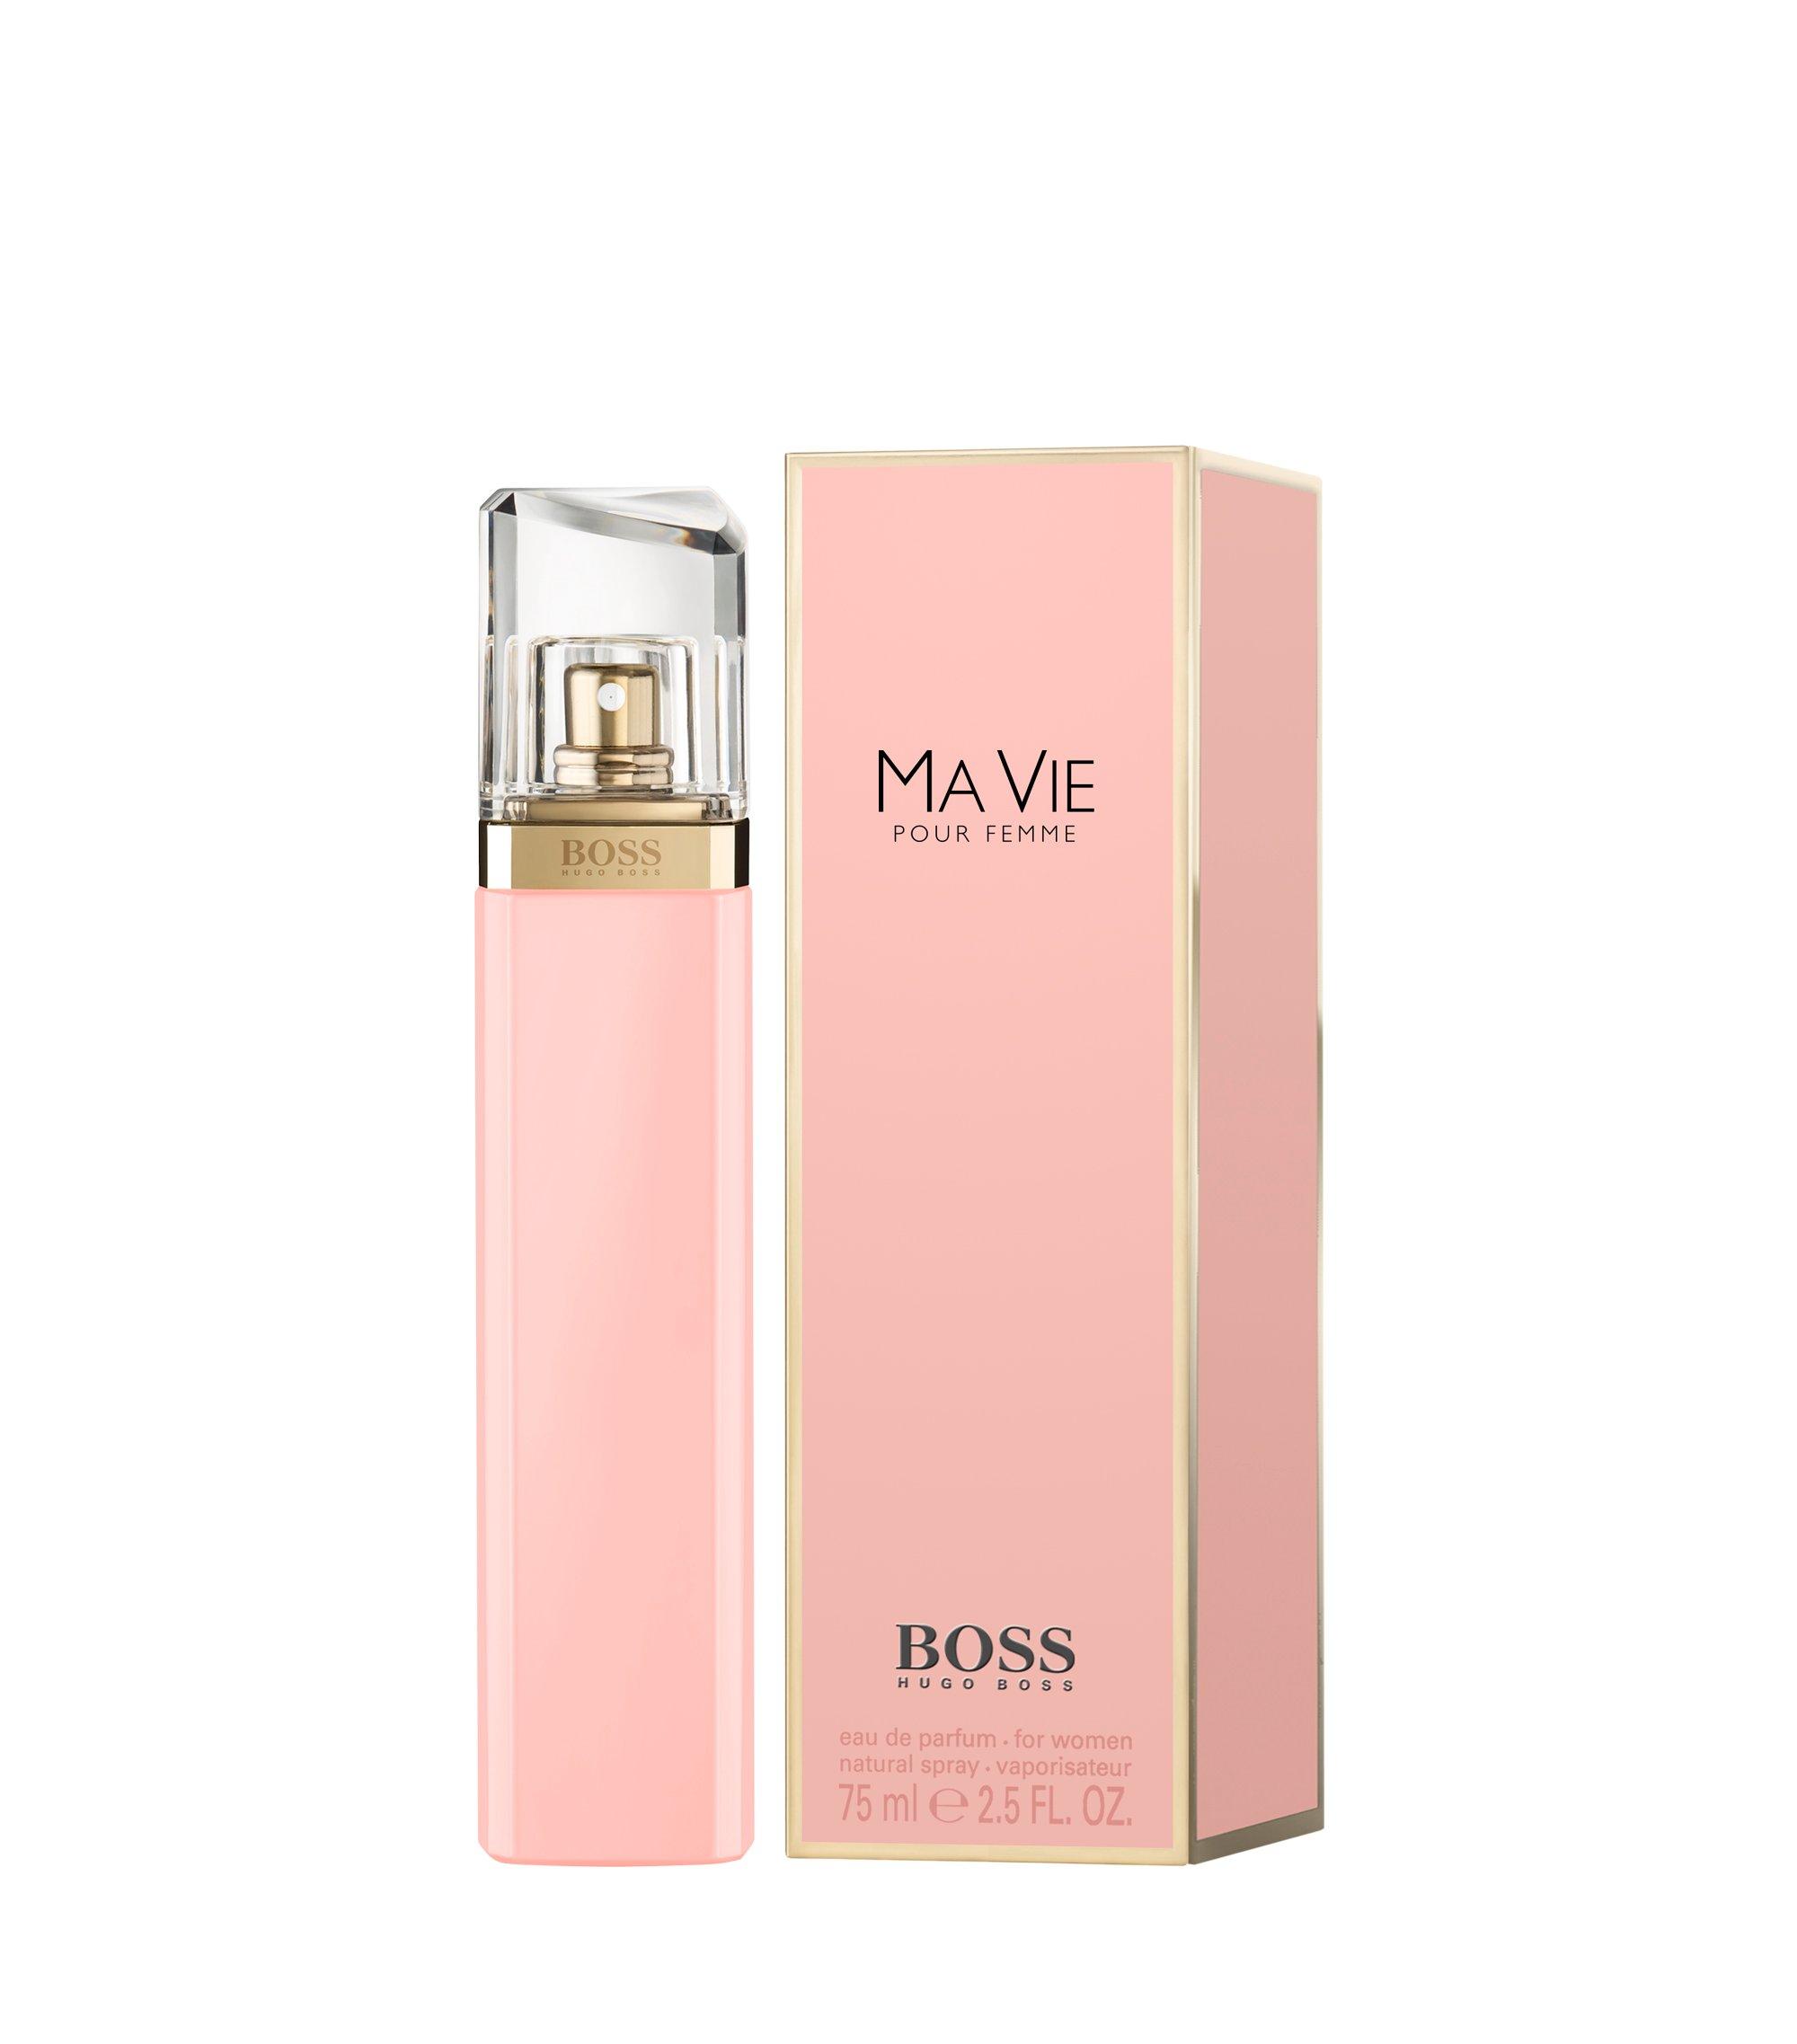 Eau de parfum BOSS Ma Vie pour femme da 75ml, Assorted-Pre-Pack